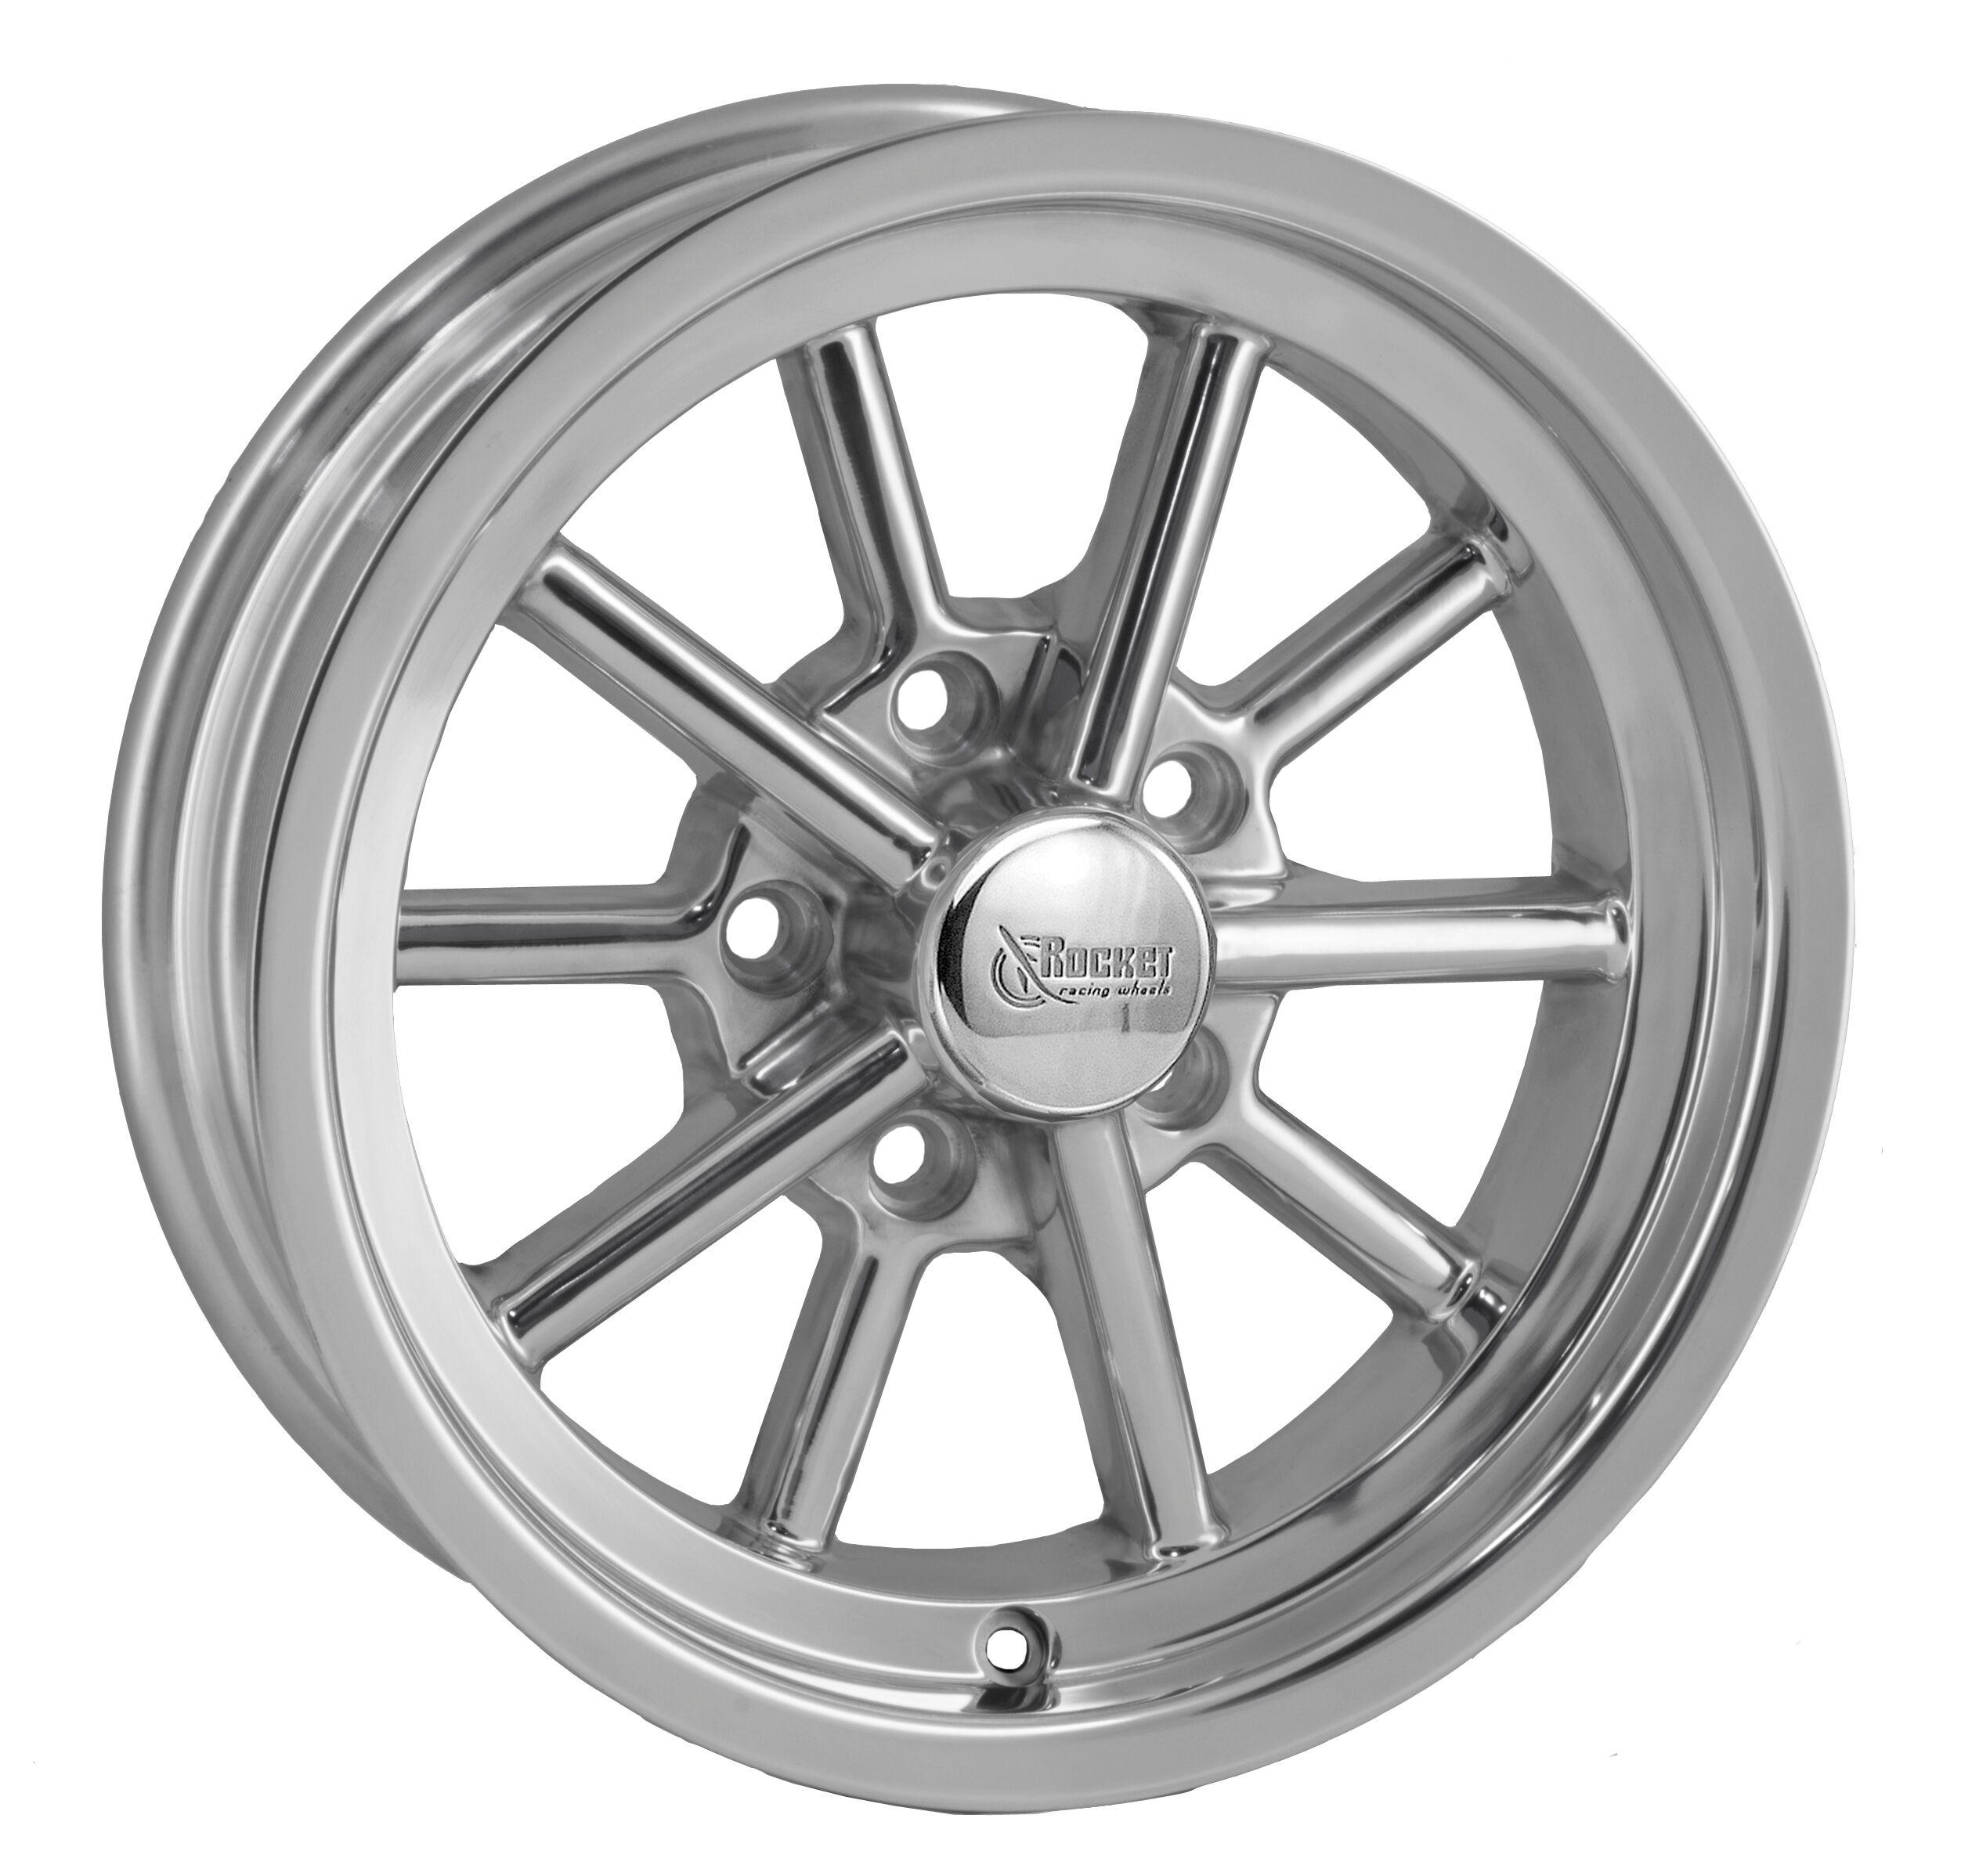 Rocket Racing Wheels Launcher - Polished Rim